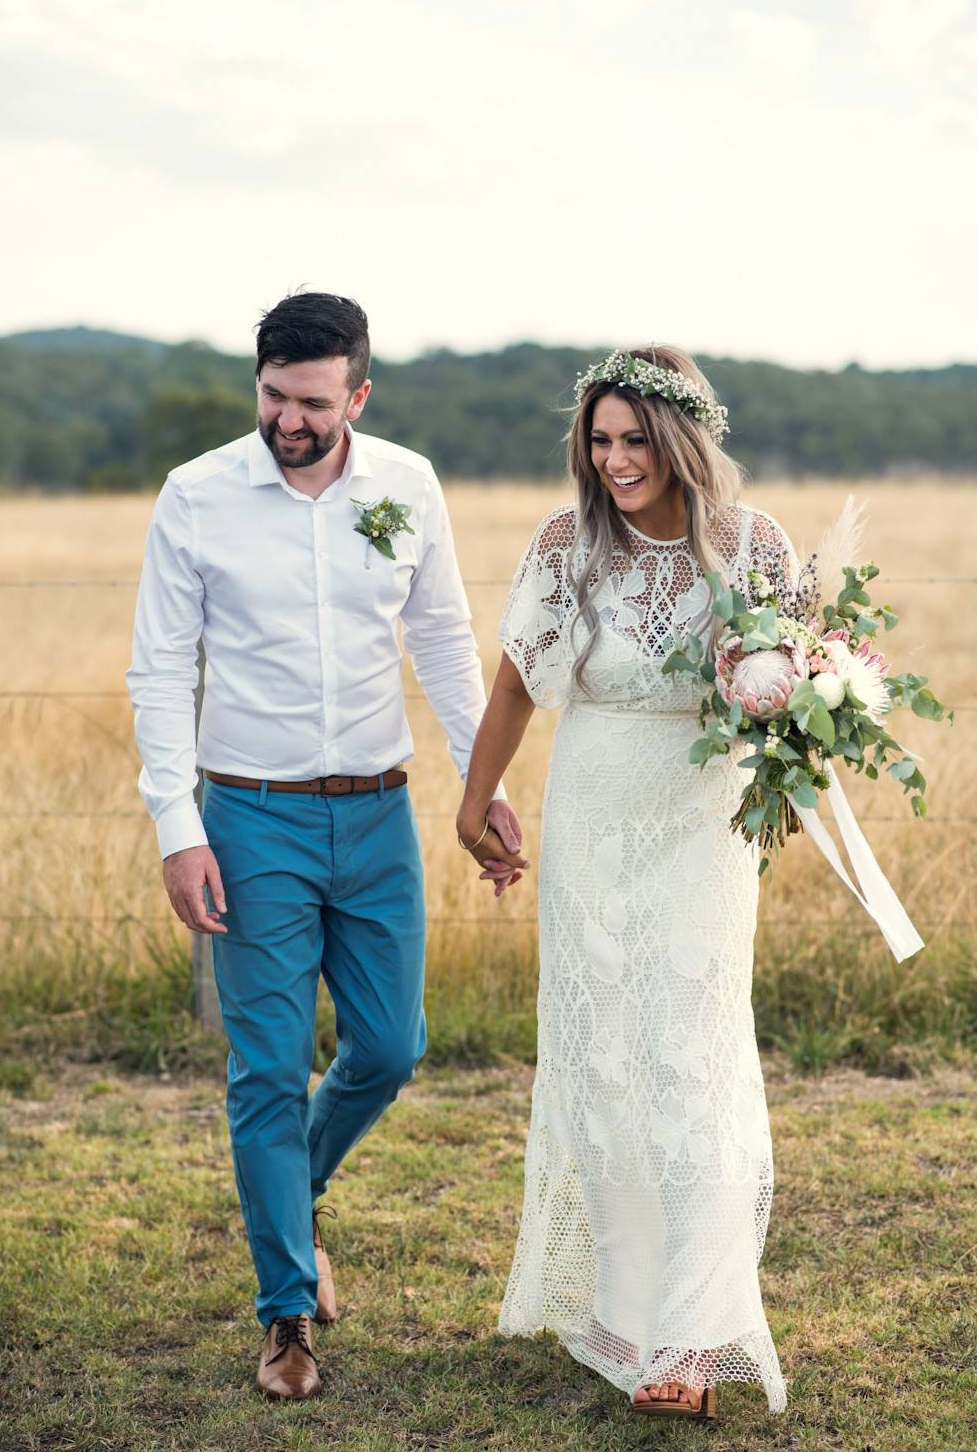 nics-wedding-pro-4.jpg